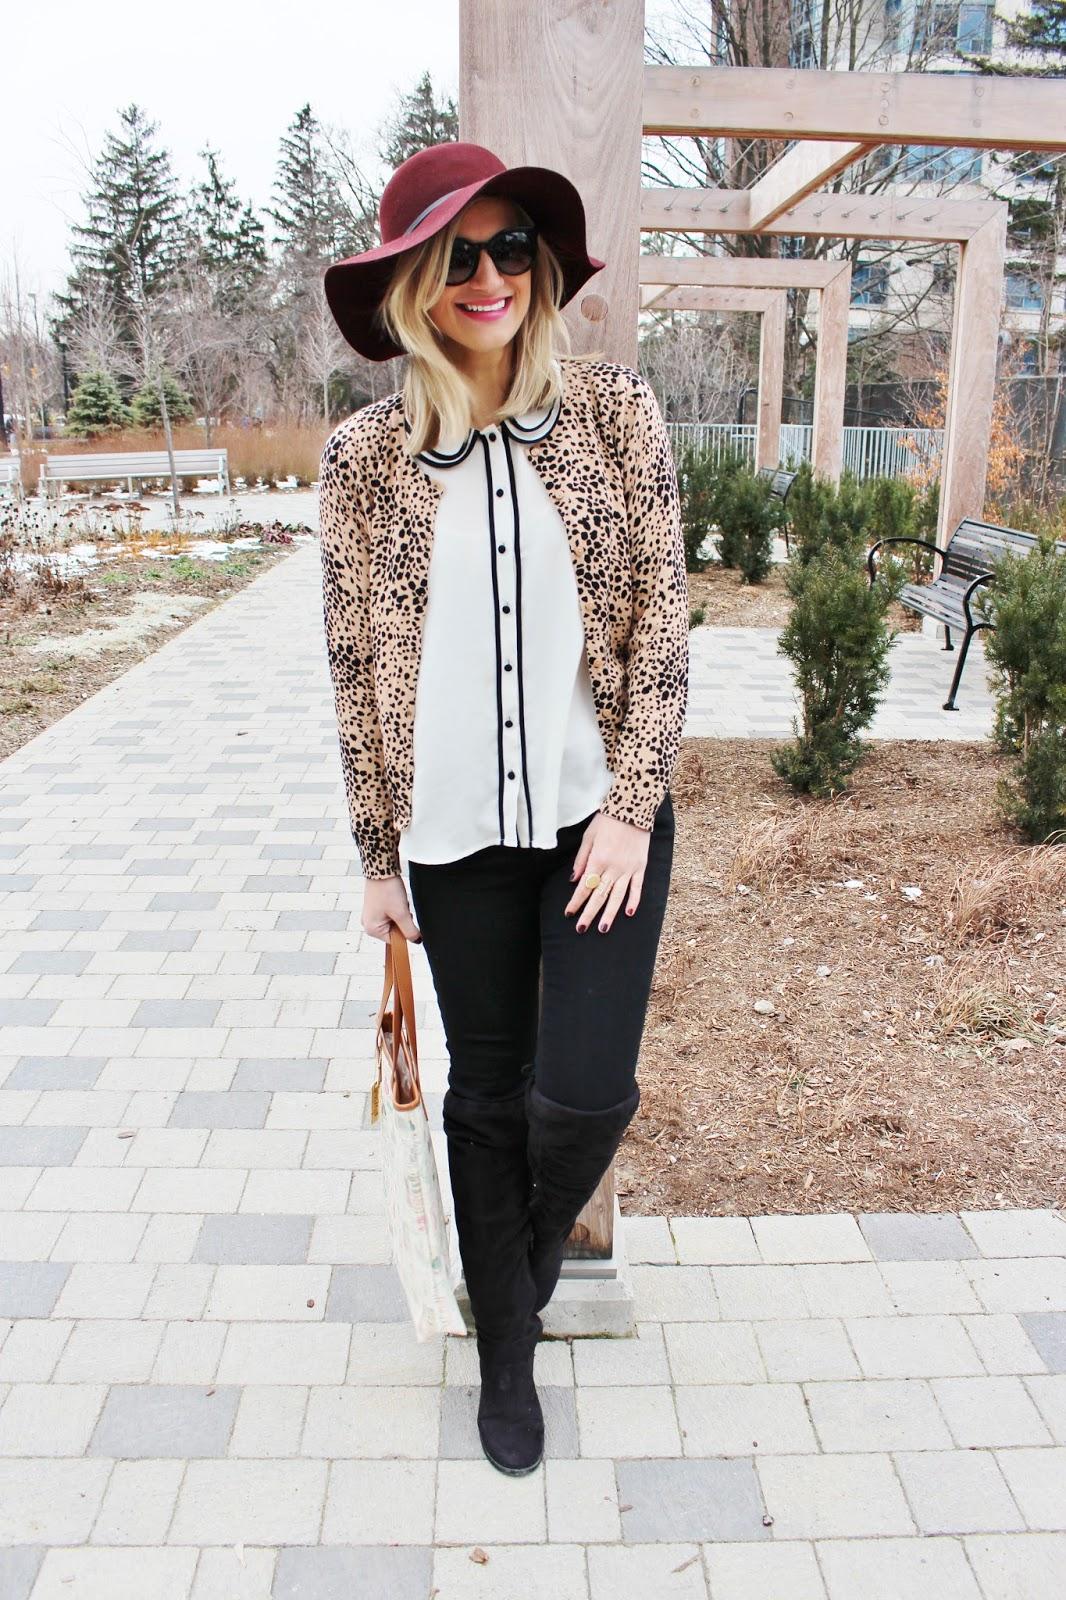 bijuleni - leopard cardi and black jeans